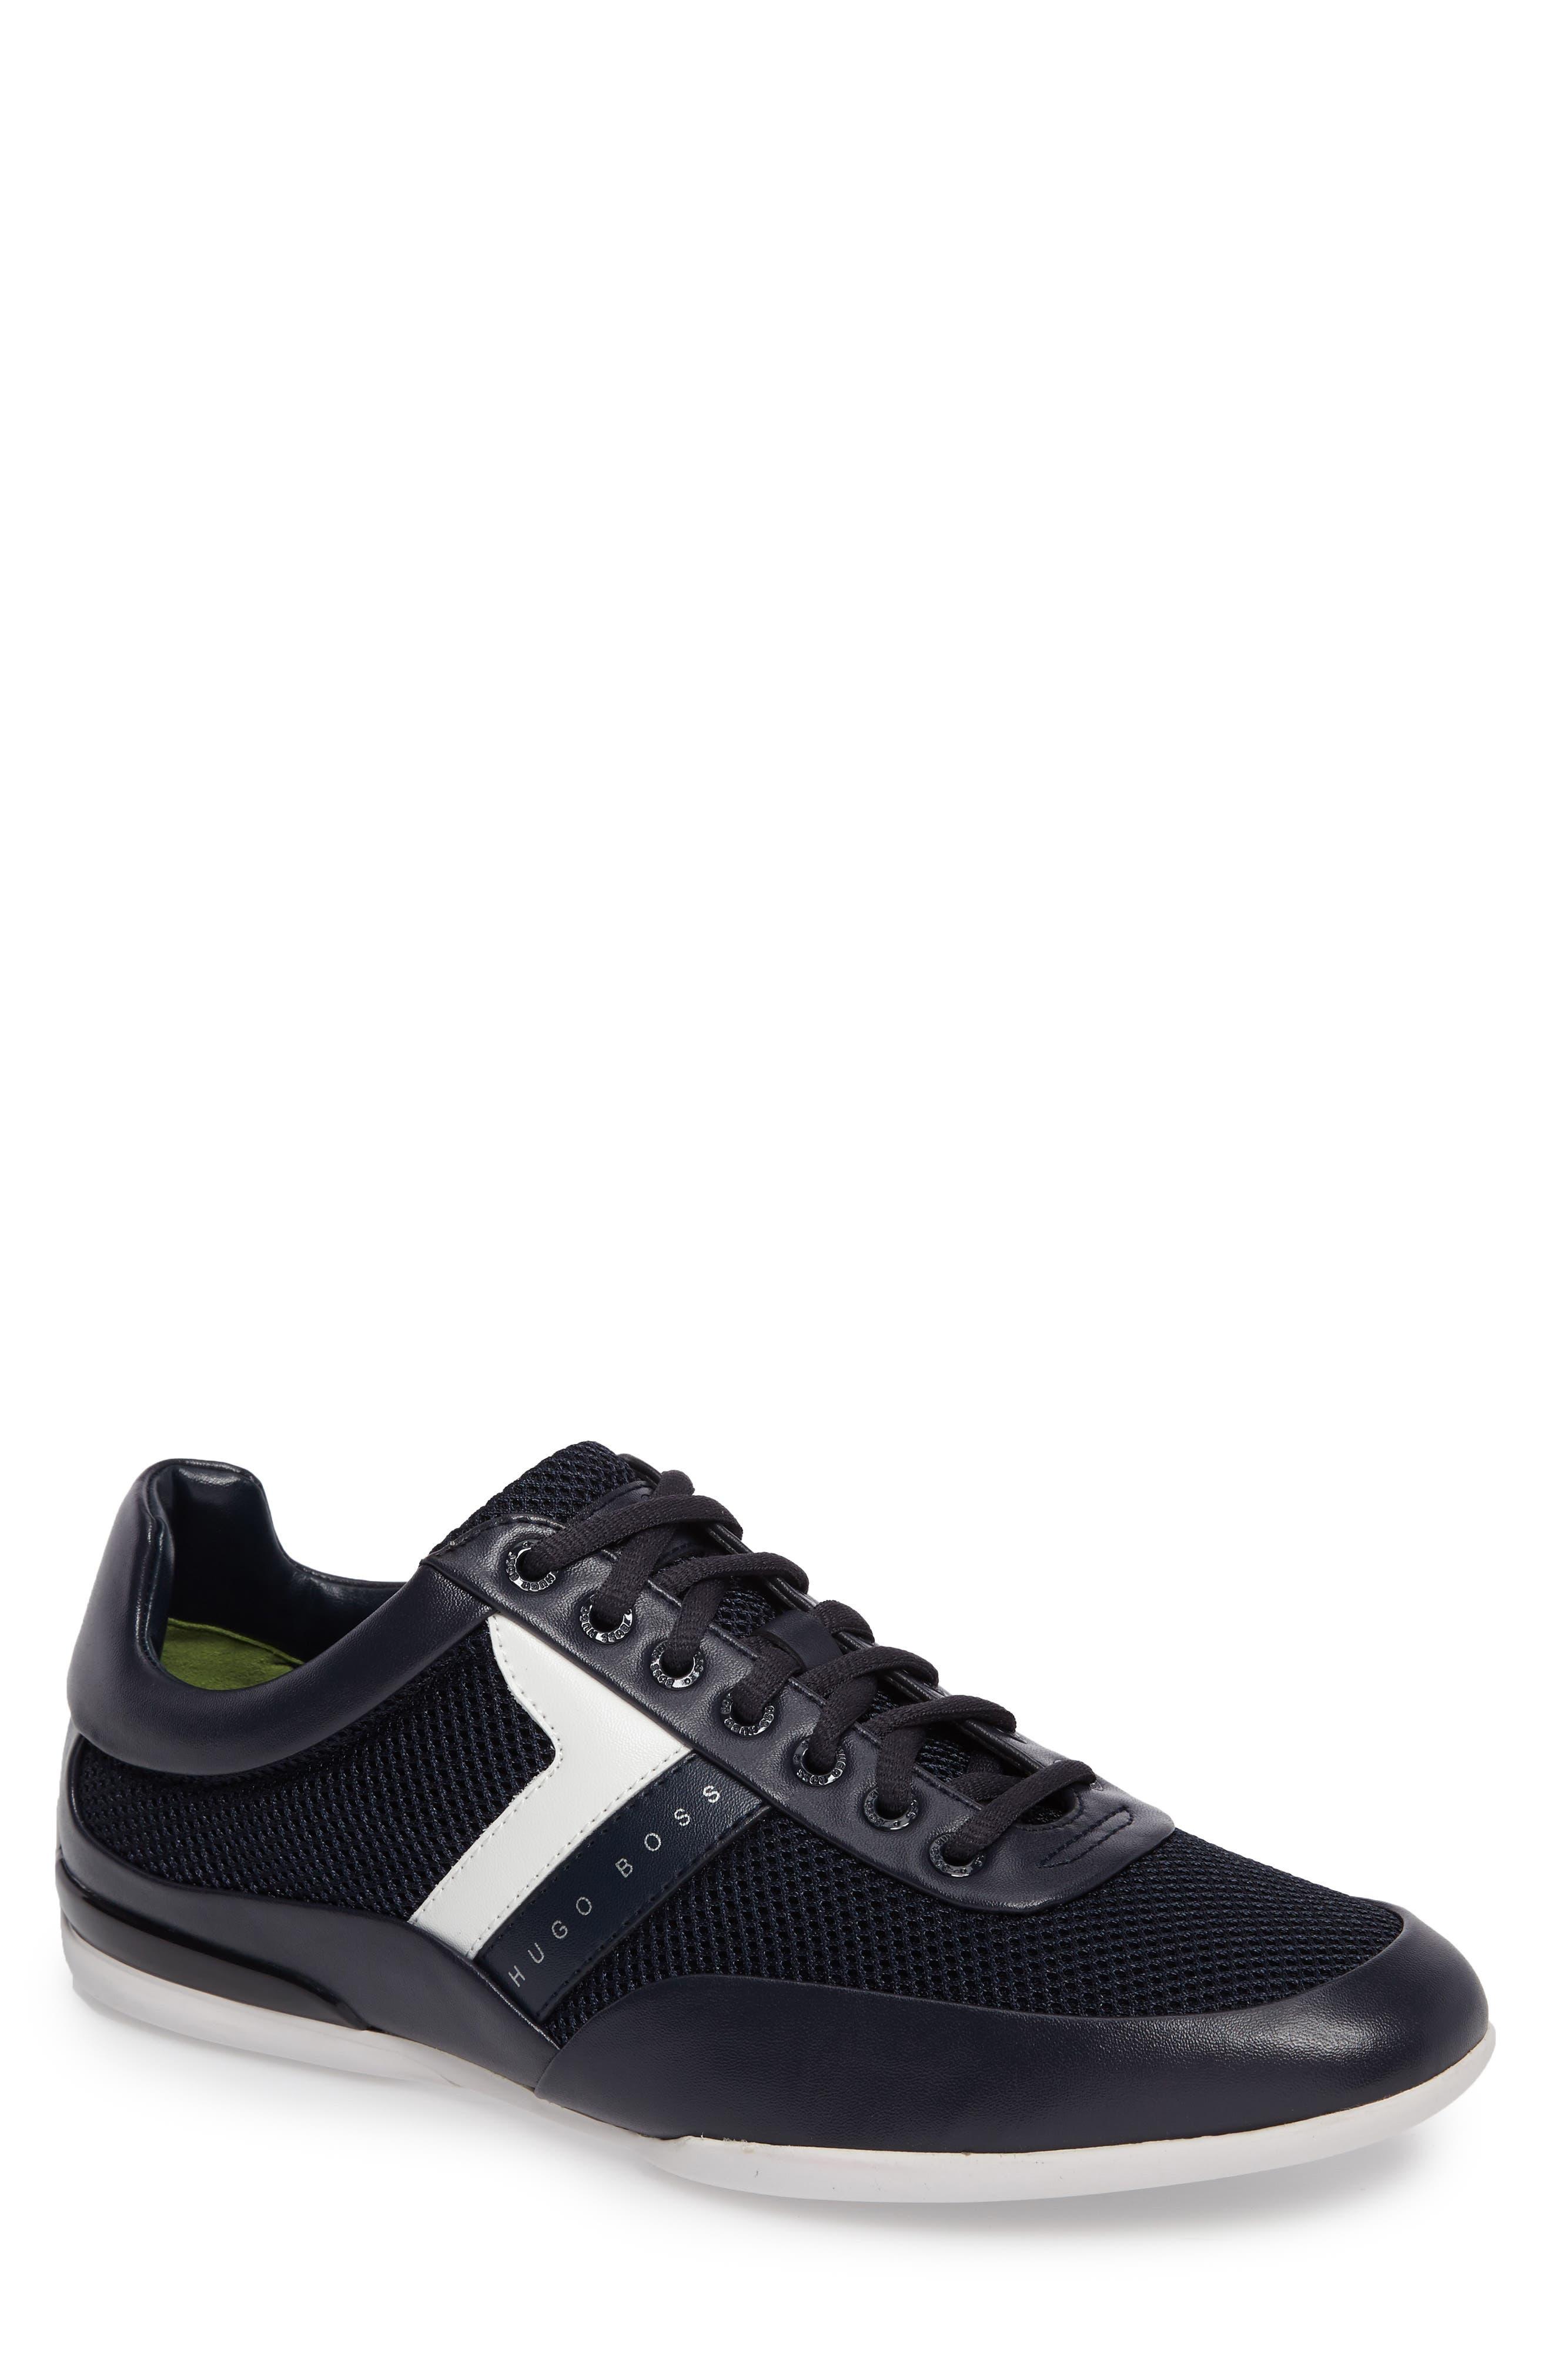 Main Image - BOSS Green Space Sneaker (Men)